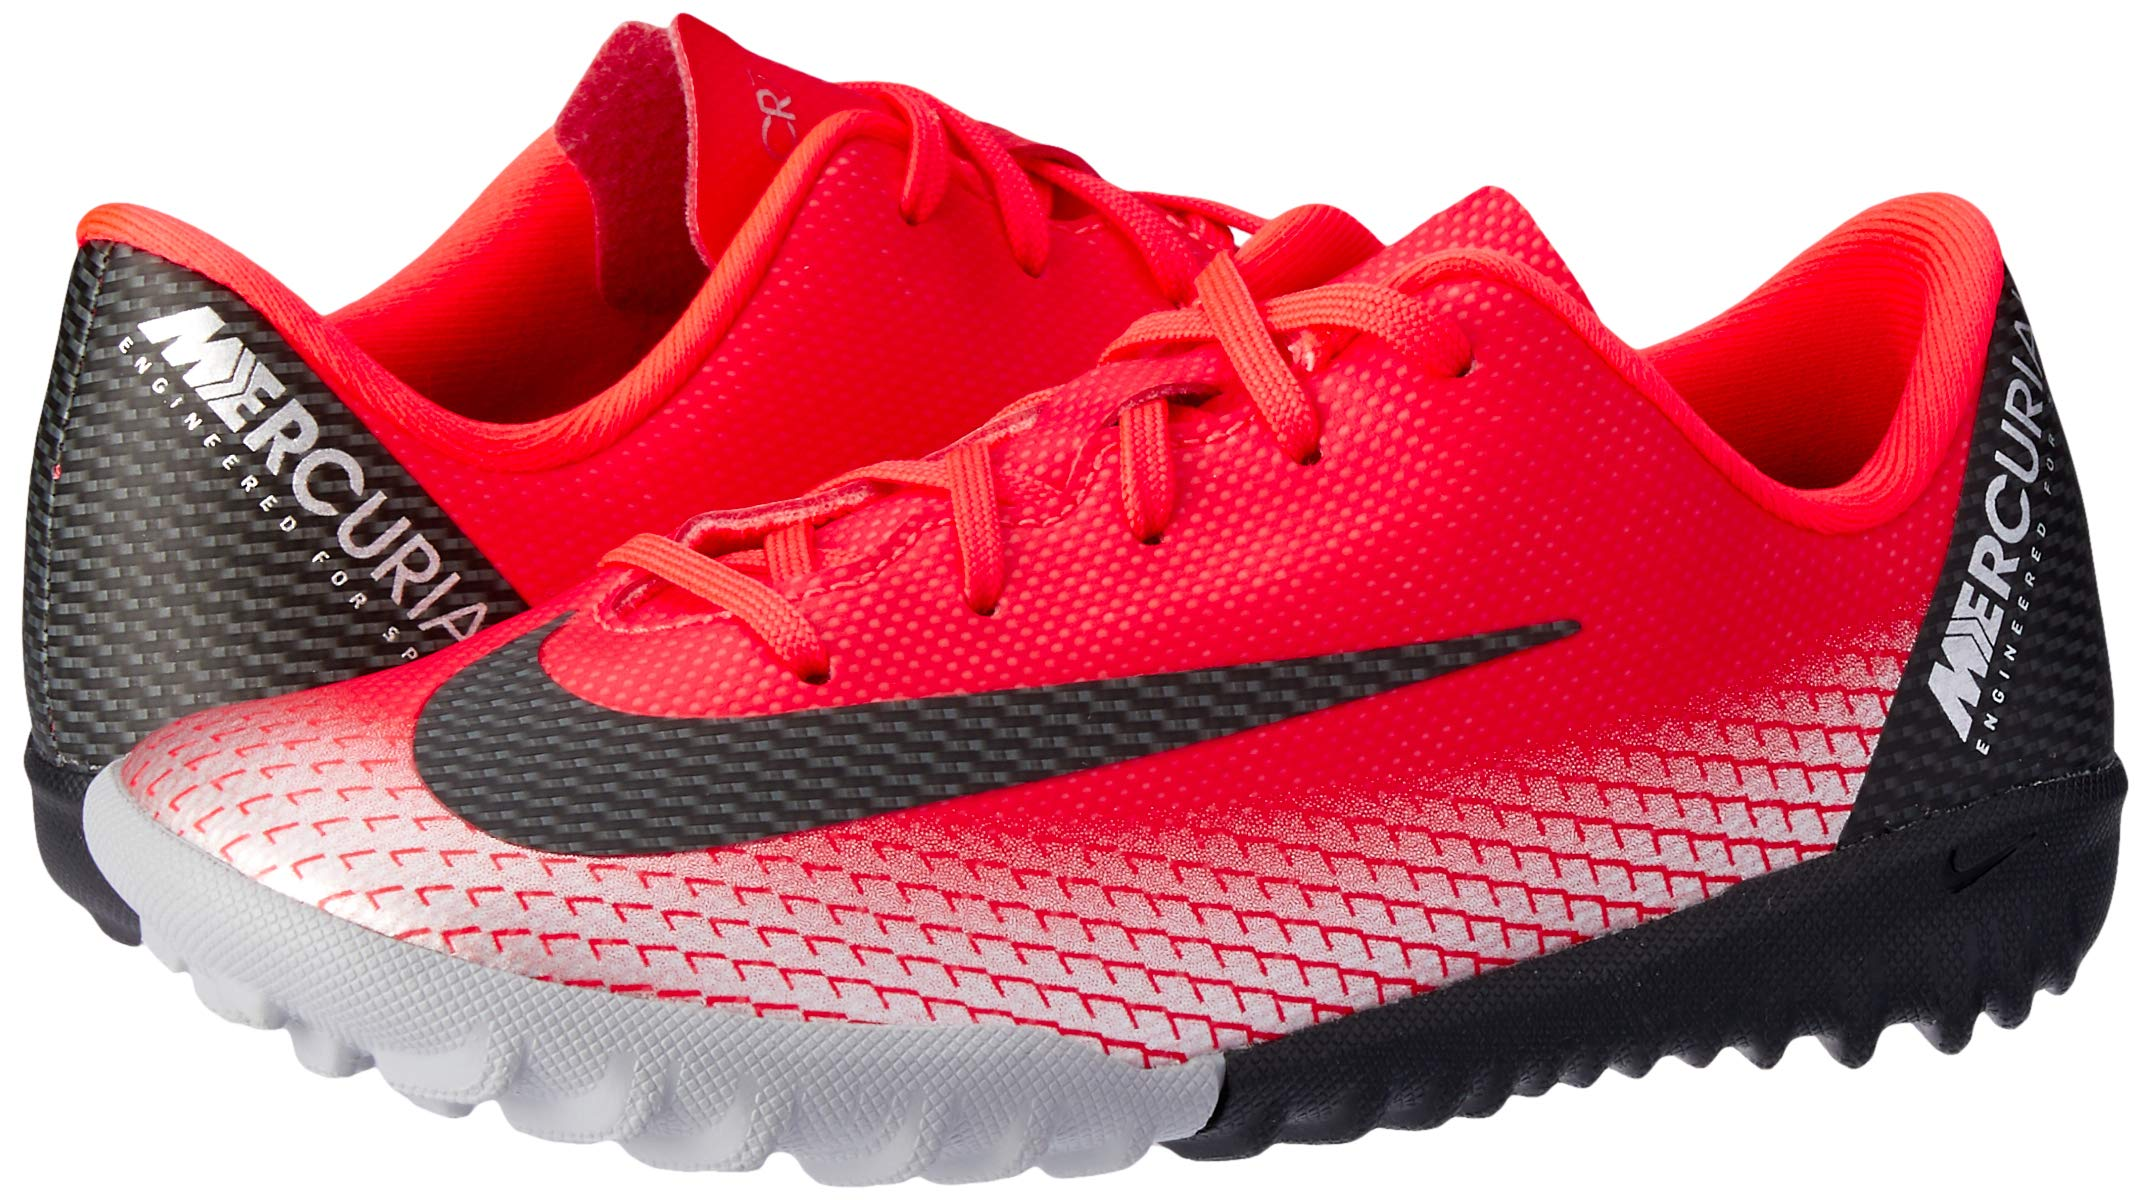 Nike Youth Soccer Jr Mercurial Vapor 12 Academy CR7 Turf Shoes (1 M US Little Kid)